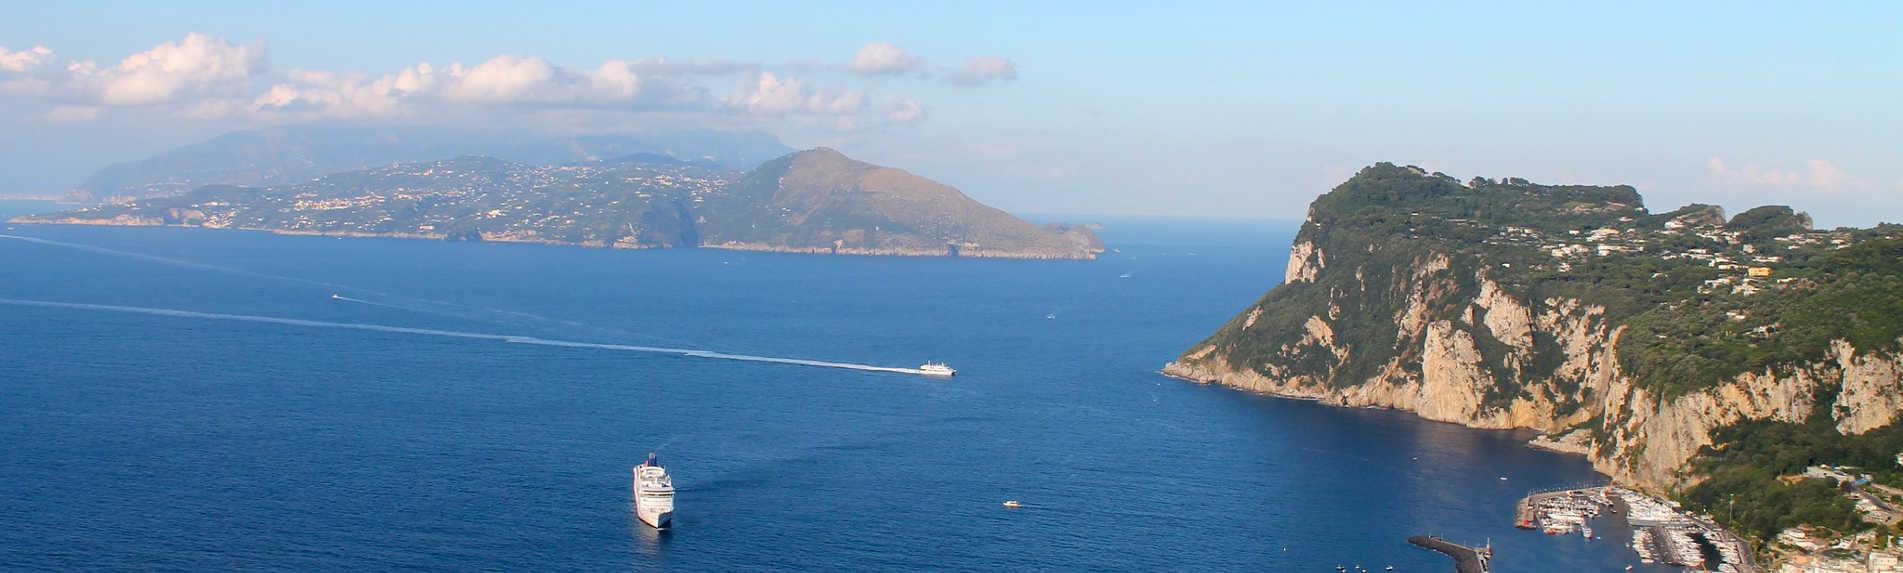 Capri Island Virtual Tour